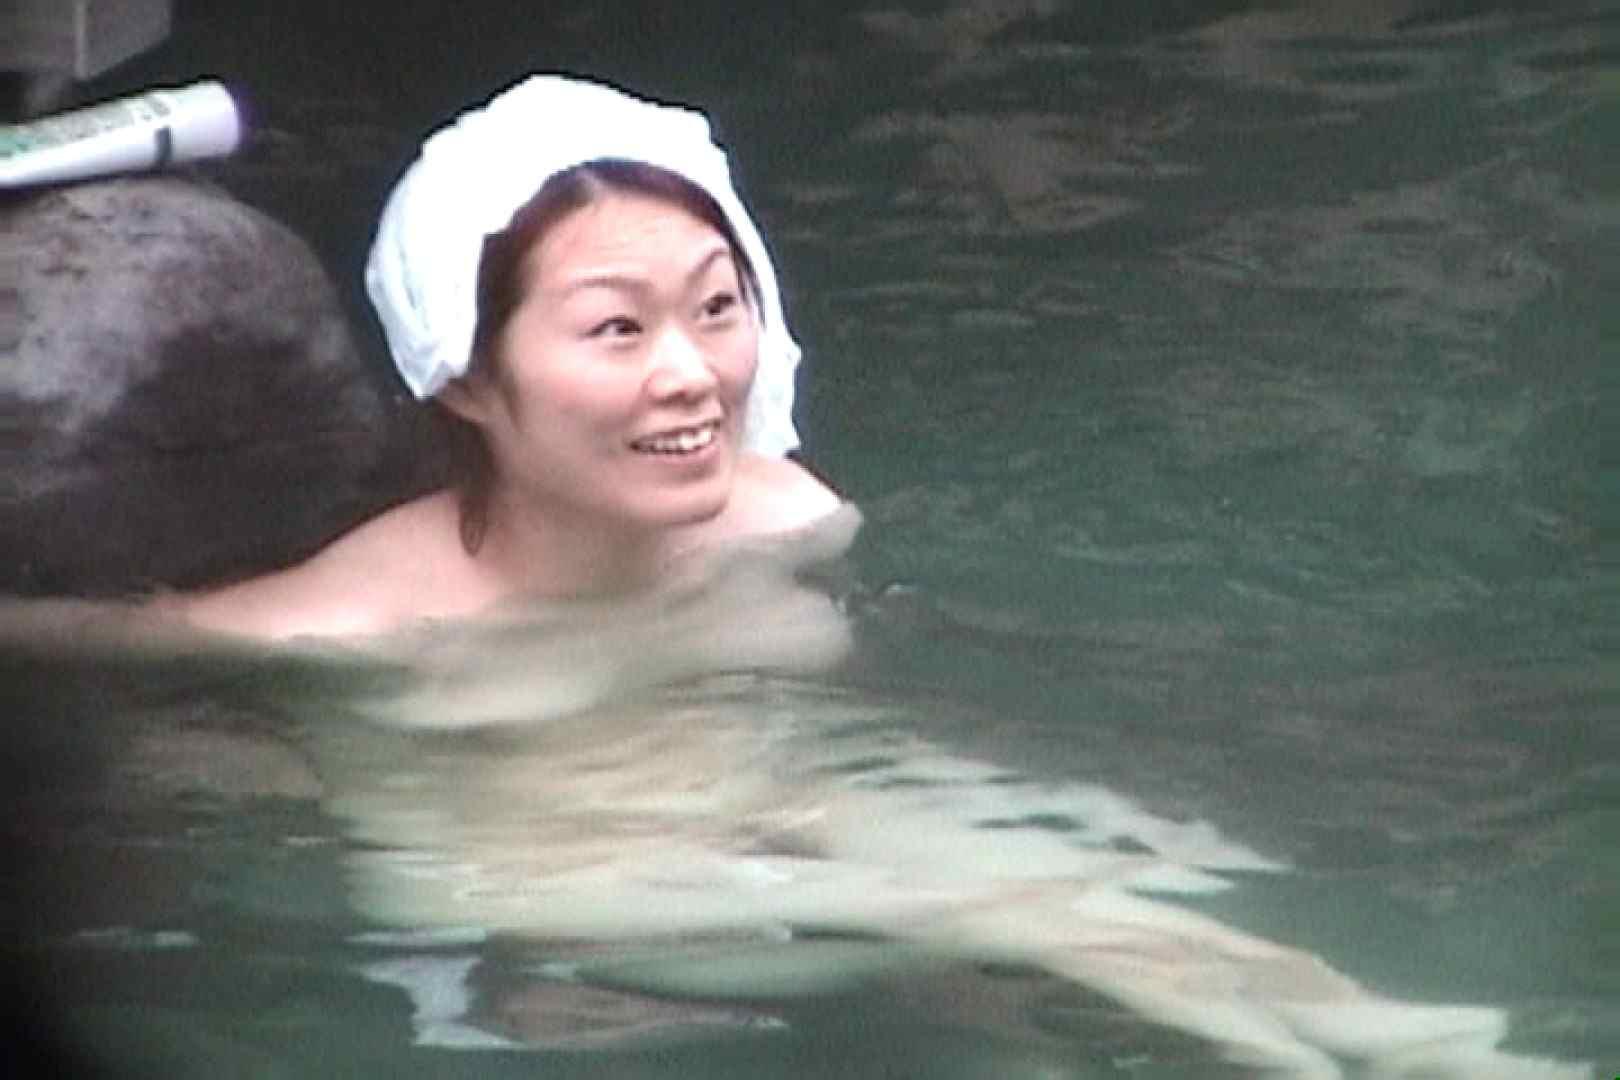 Aquaな露天風呂Vol.71【VIP限定】 綺麗なOLたち | 盗撮  66枚 31